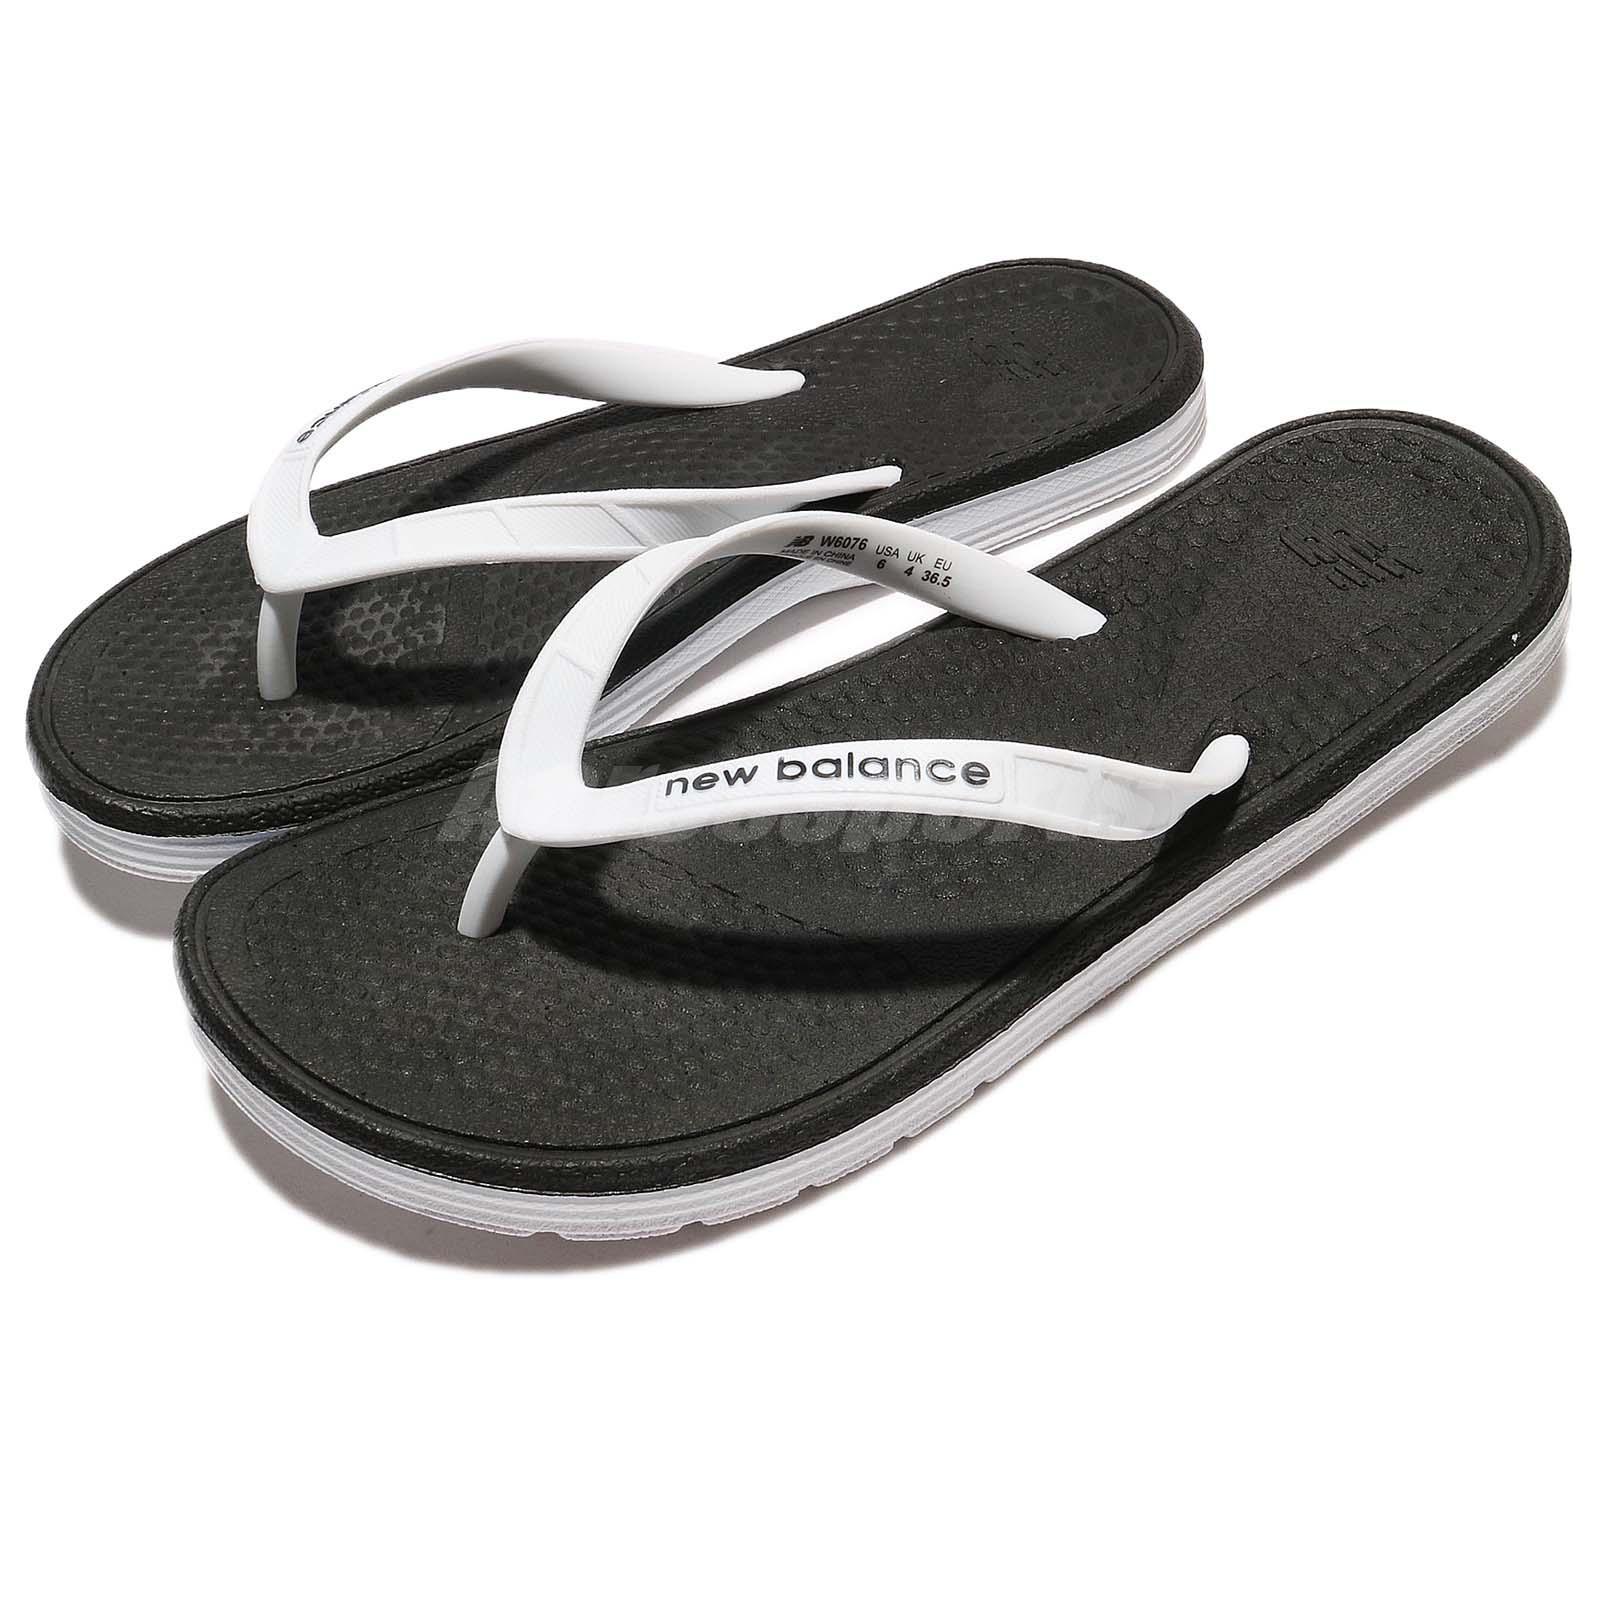 abda18d9c8214 Details about New Balance W6076WBK B White Black Women Sandal Thong  Flip-Flops W6076WBKB